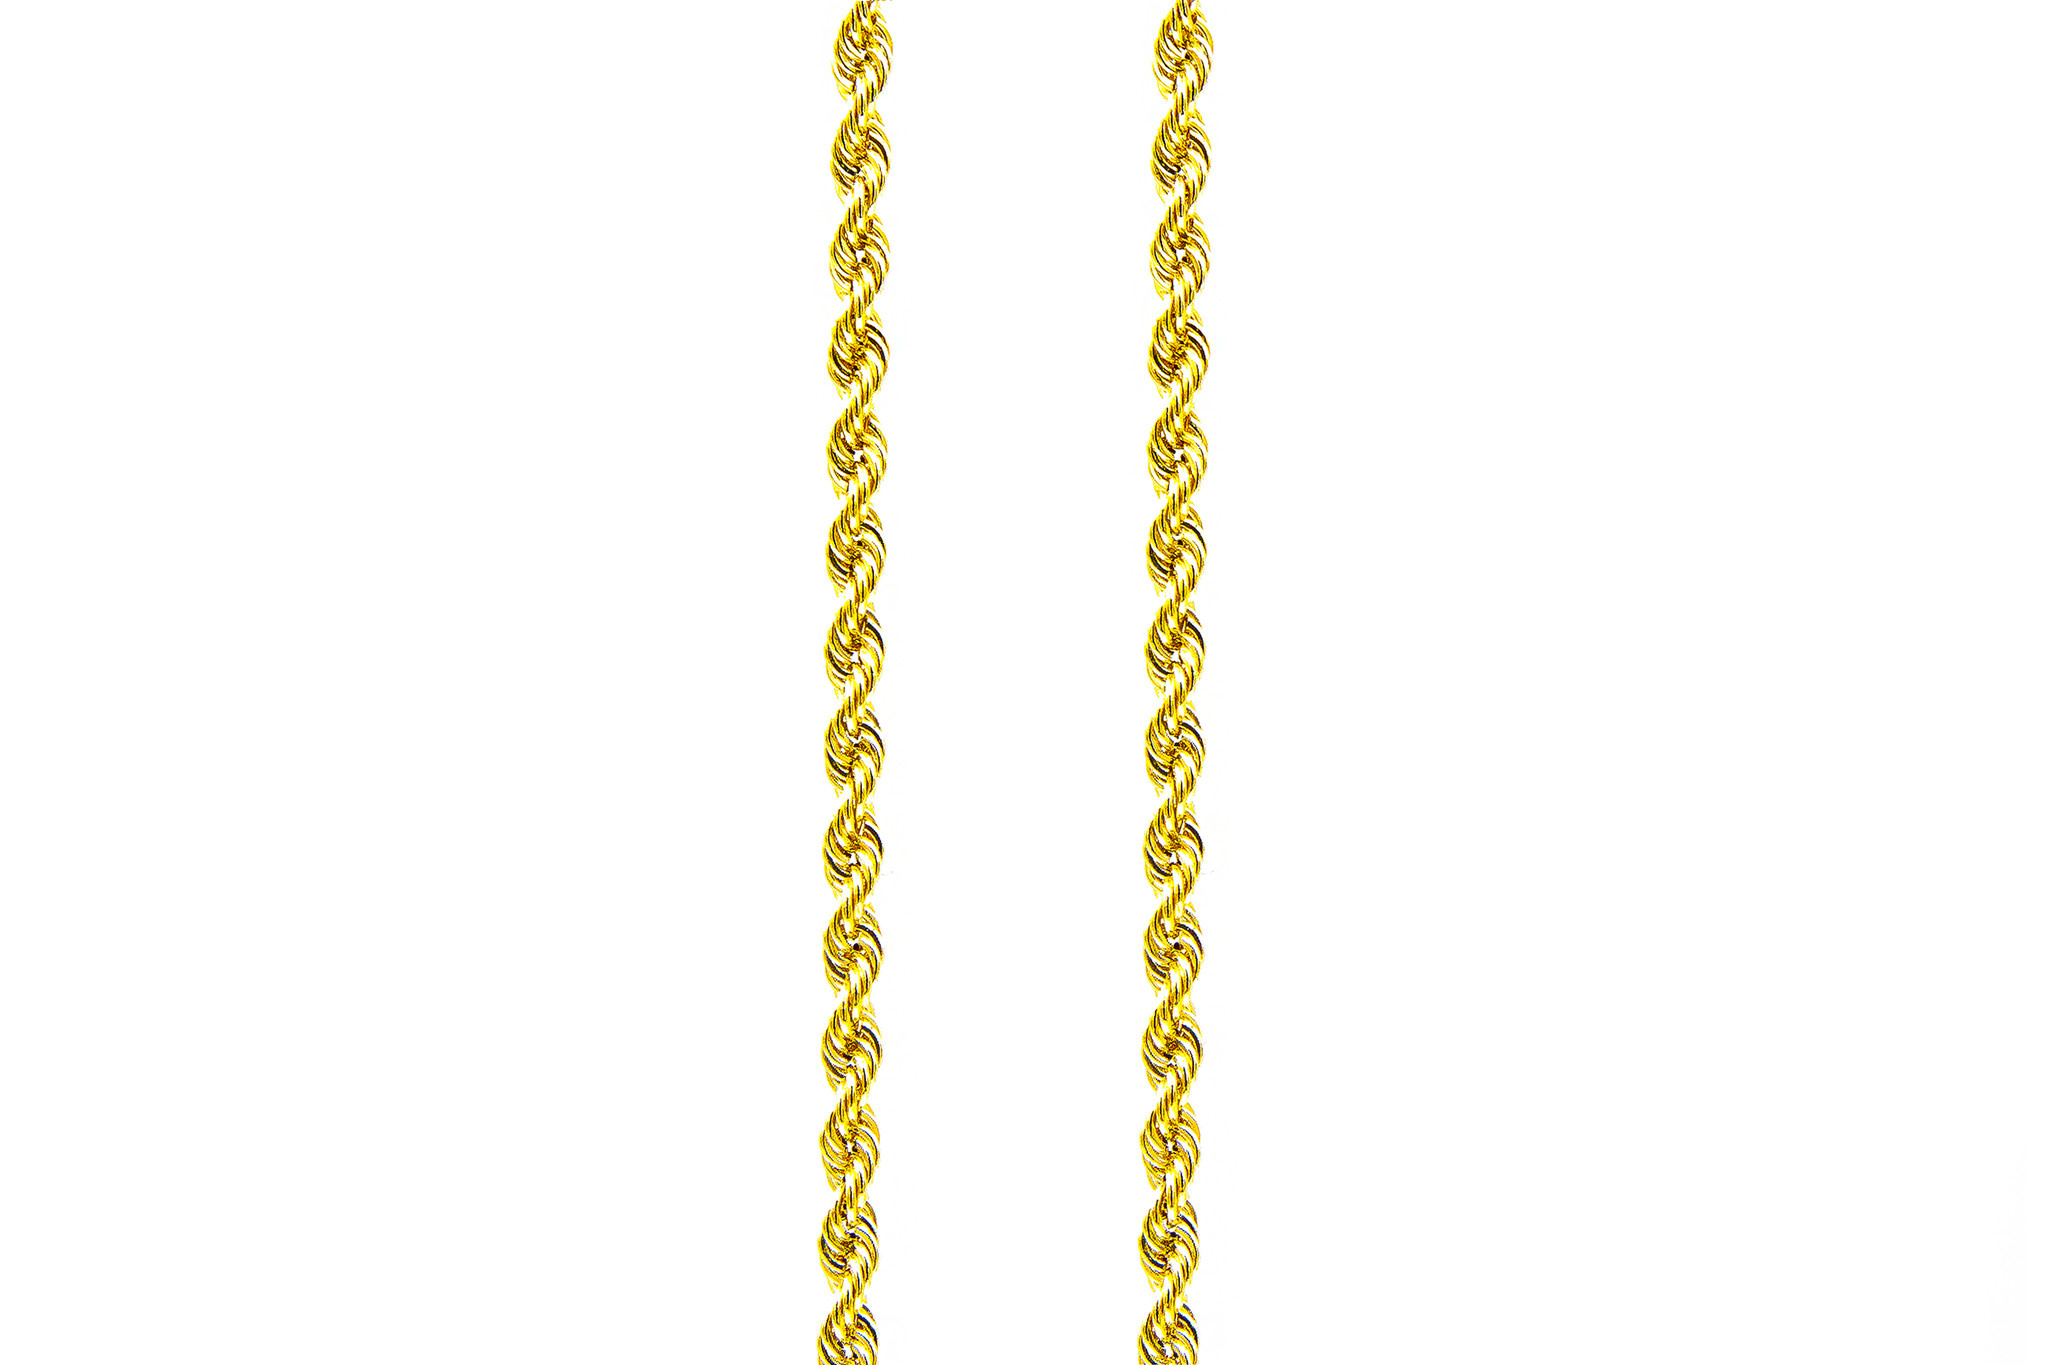 Rope chain Surinaams goud 14kt 3mm-3